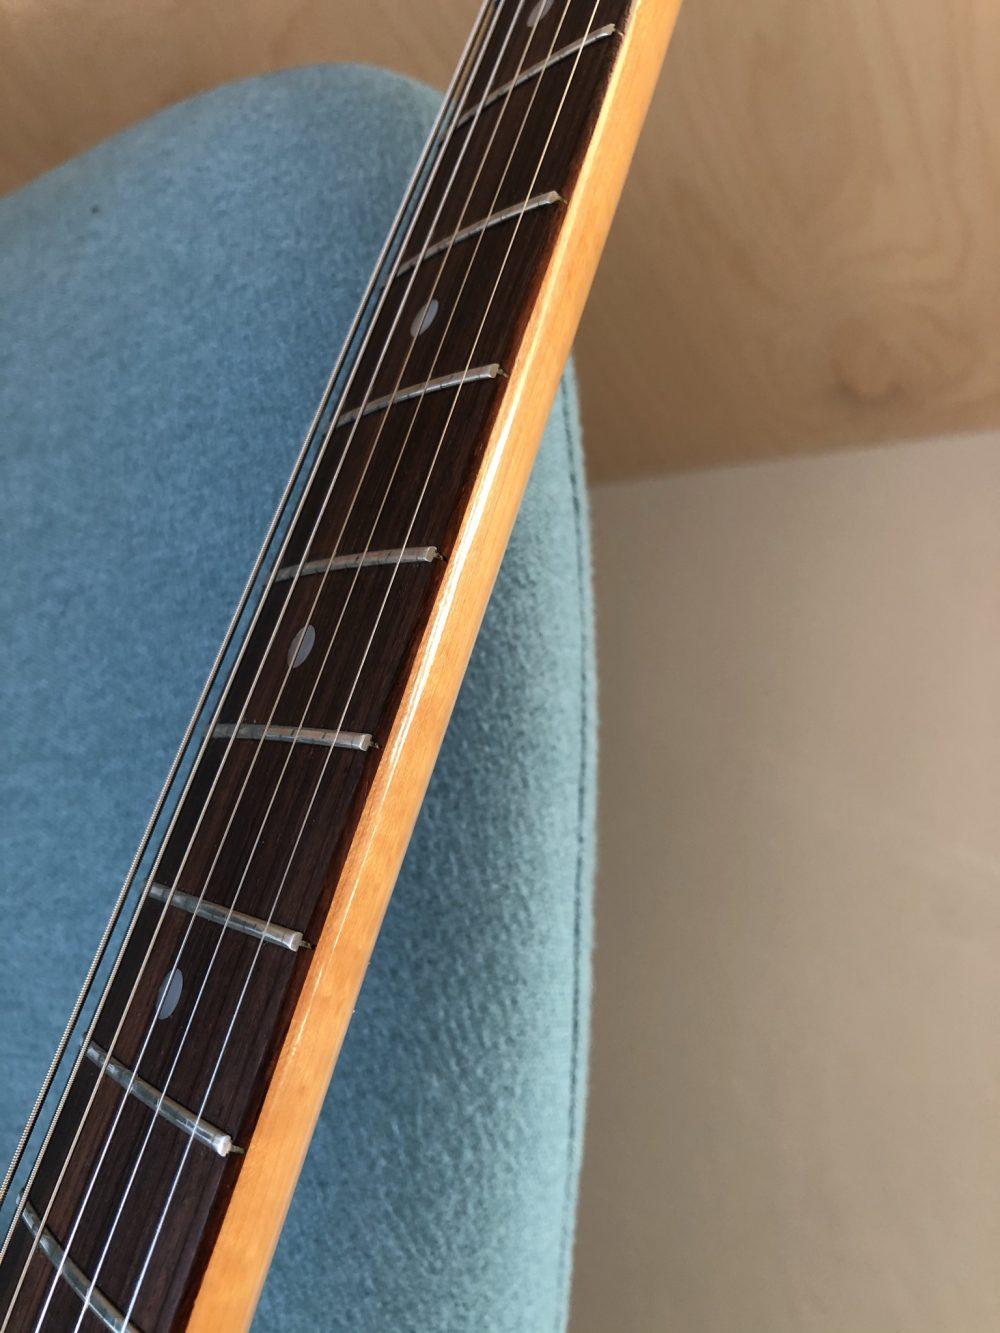 Photo contains vintage Japanese guitar: Fernandes FST Stratocaster